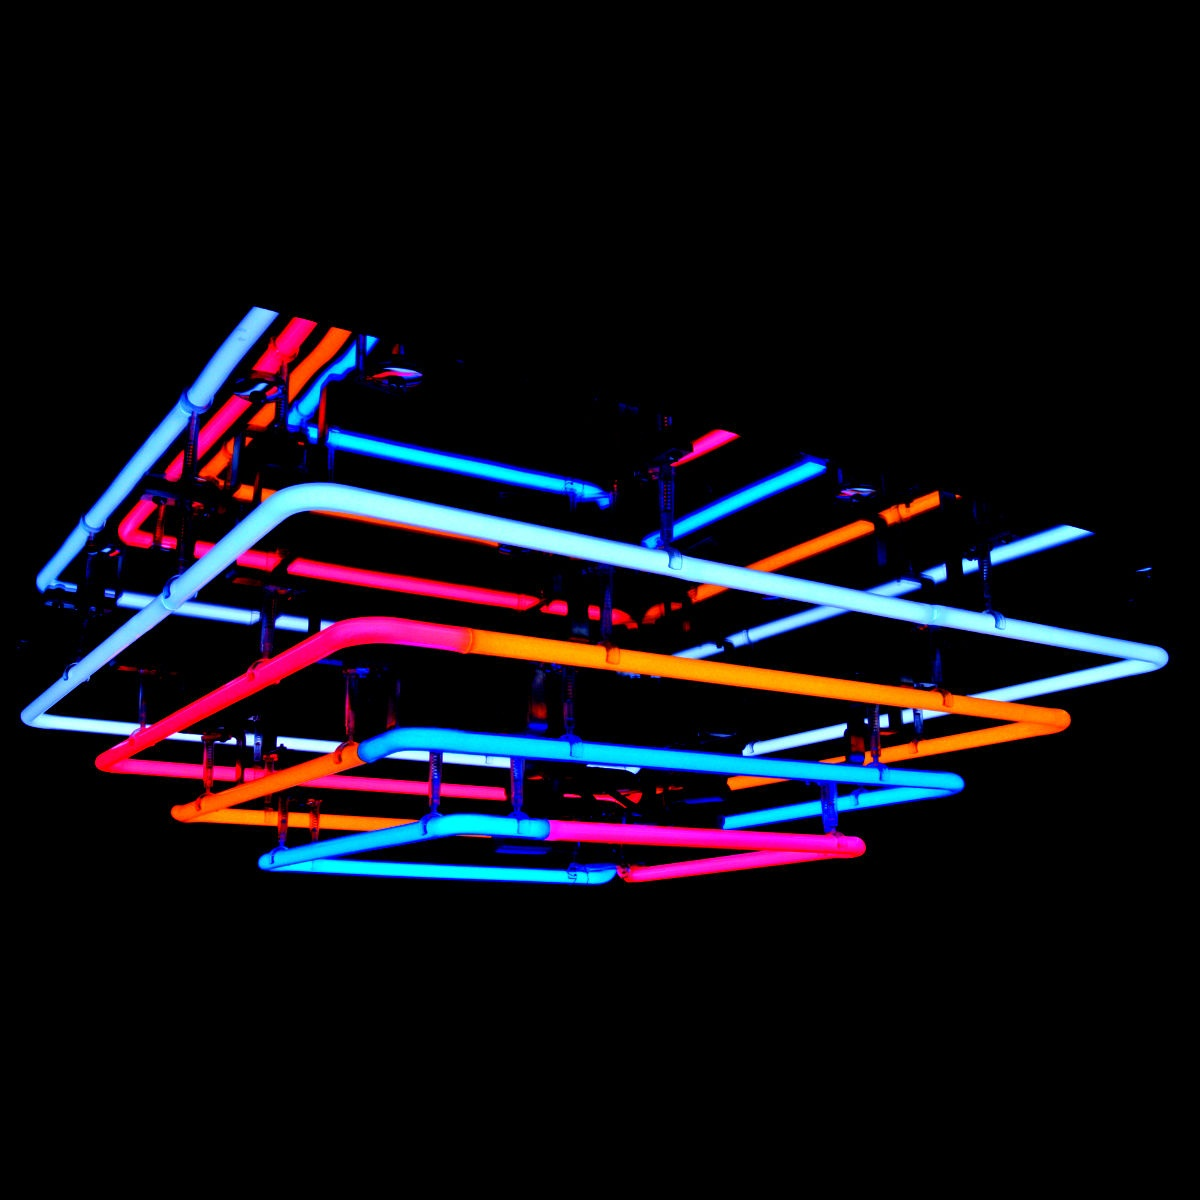 Mirrored Stained Glass Neon Chandelier by John Barton - BartonNeonMagic.com